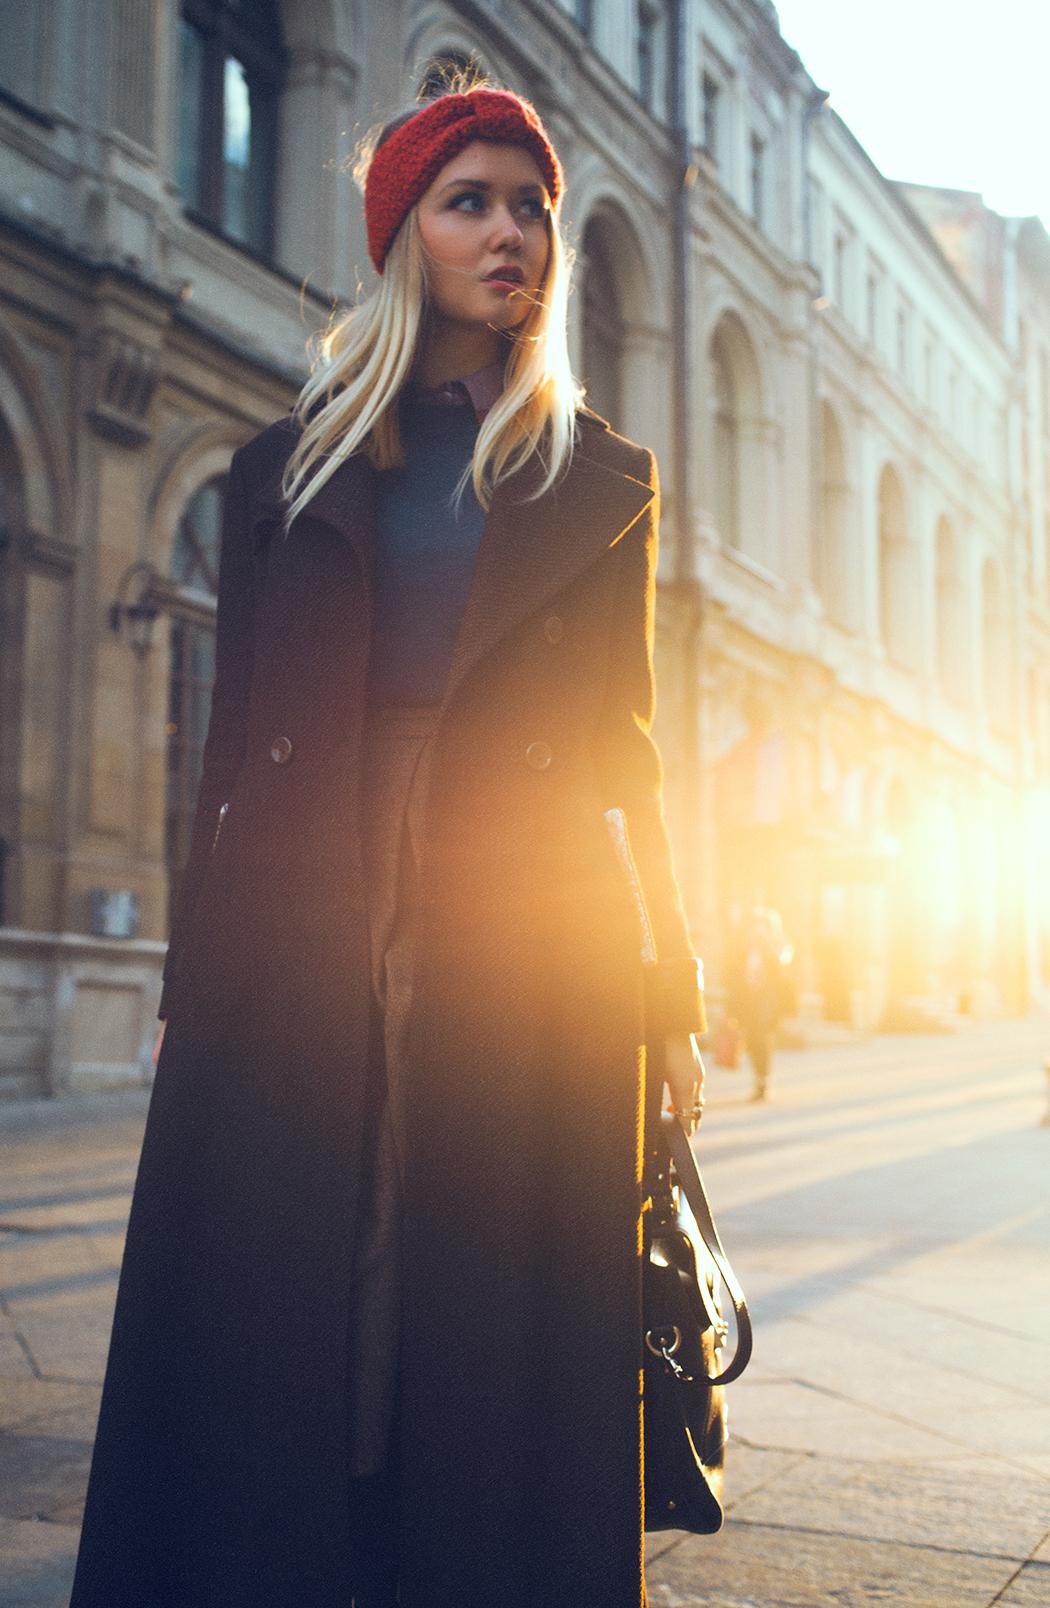 inspiration, streetstyle, autumn outfit, autumn streetstyle, knitted sweater, marina makaron, annamidday, top fashion blogger, top russian fashion blogger, фэшн блогер, русский блогер, известный блогер, топовый блогер, russian bloger, top russian blogger, streetfashion, russian fashion blogger, blogger, fashion, style, fashionista, модный блогер, российский блогер, ТОП блогер, ootd, lookoftheday, look, популярный блогер, российский модный блогер, annamidday, top russian blogger, russian girl, с чем носить миди юбку,  girly, aldo, massimo dutti, how to wear midi skirt, красивая девушка, русская девушка, fashion week